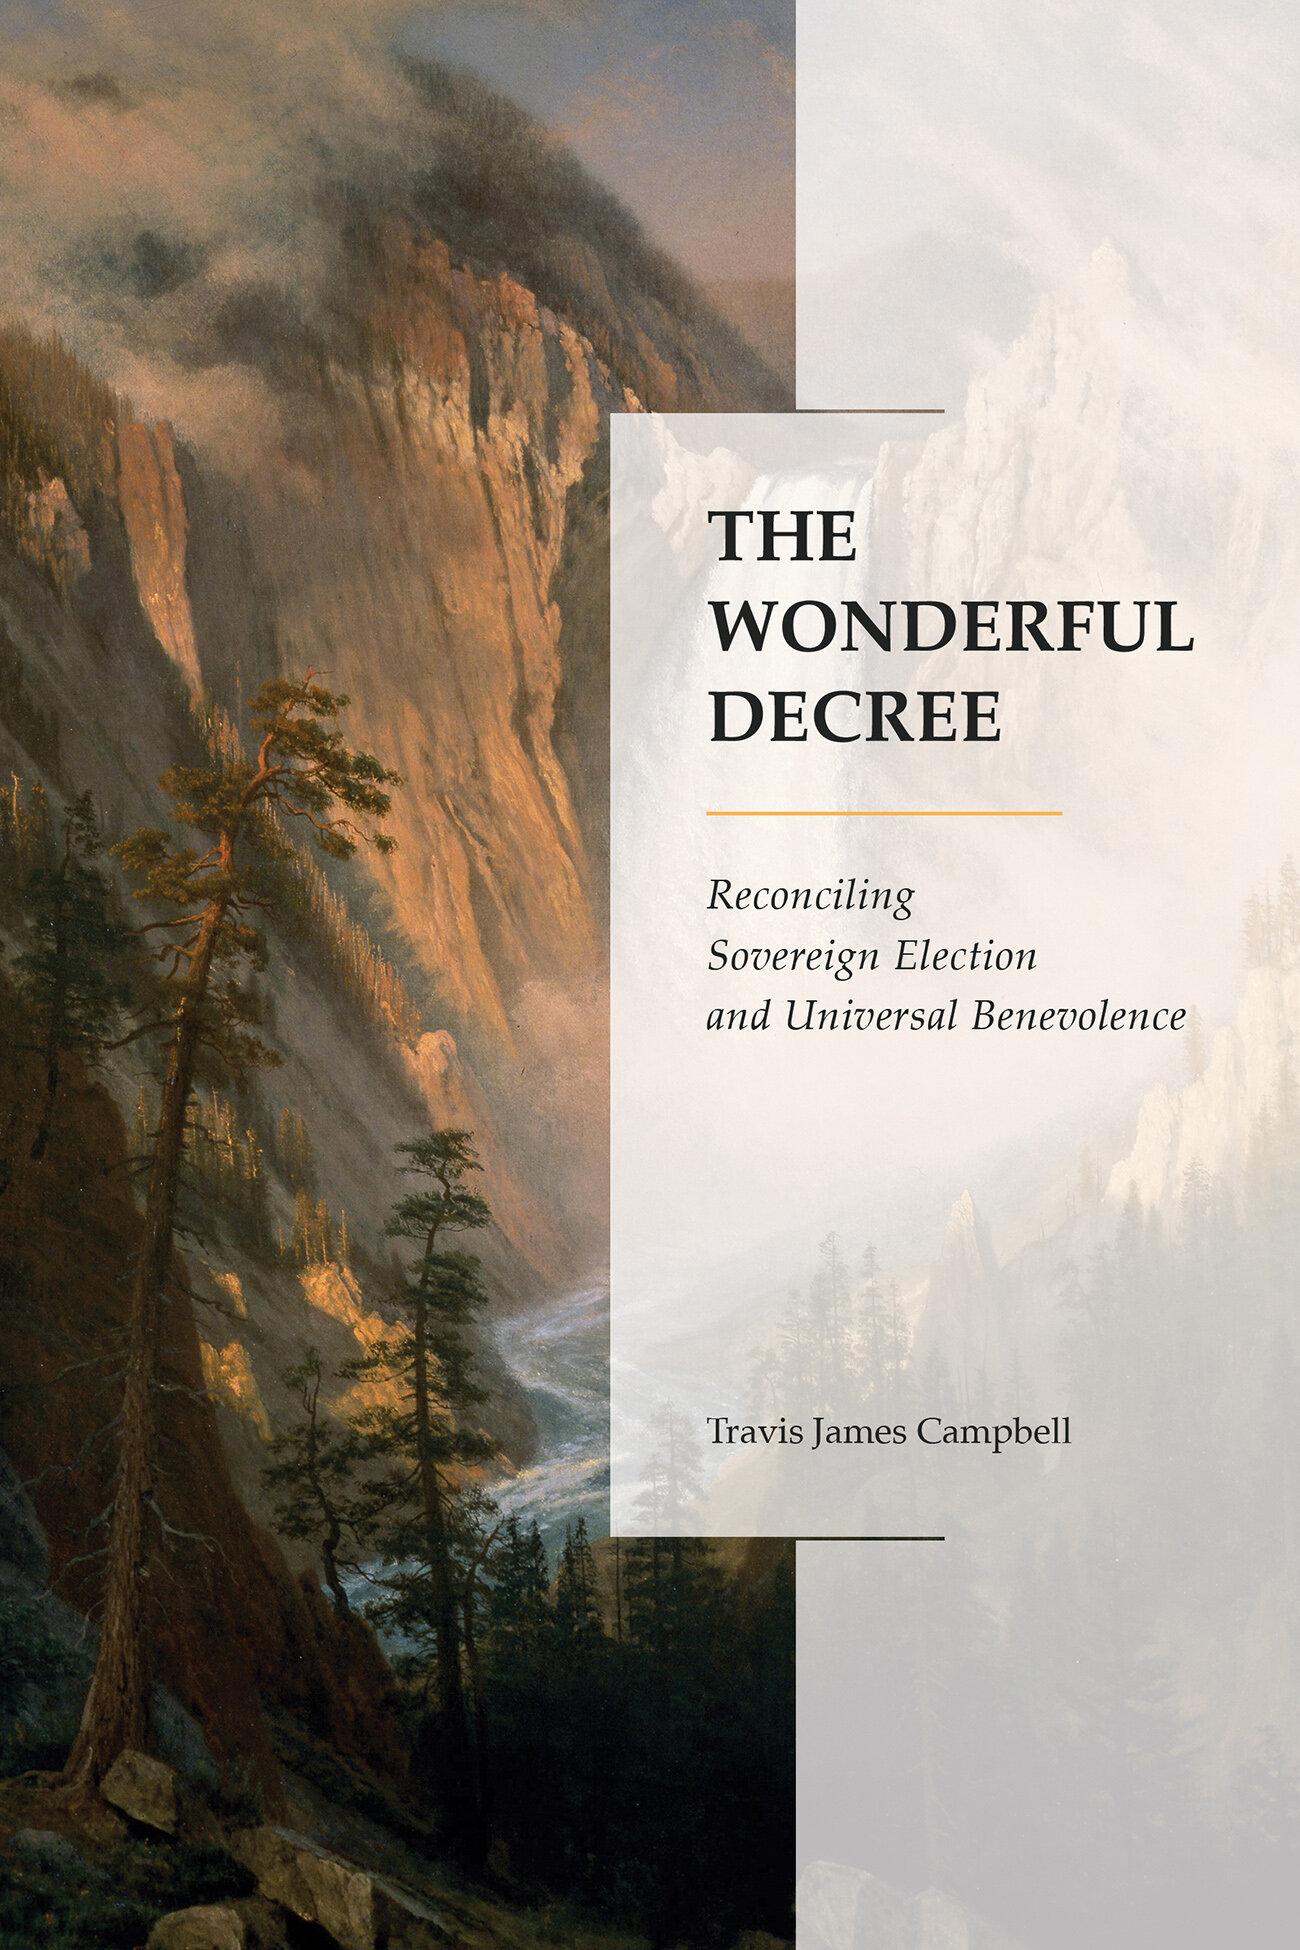 The Wonderful Decree